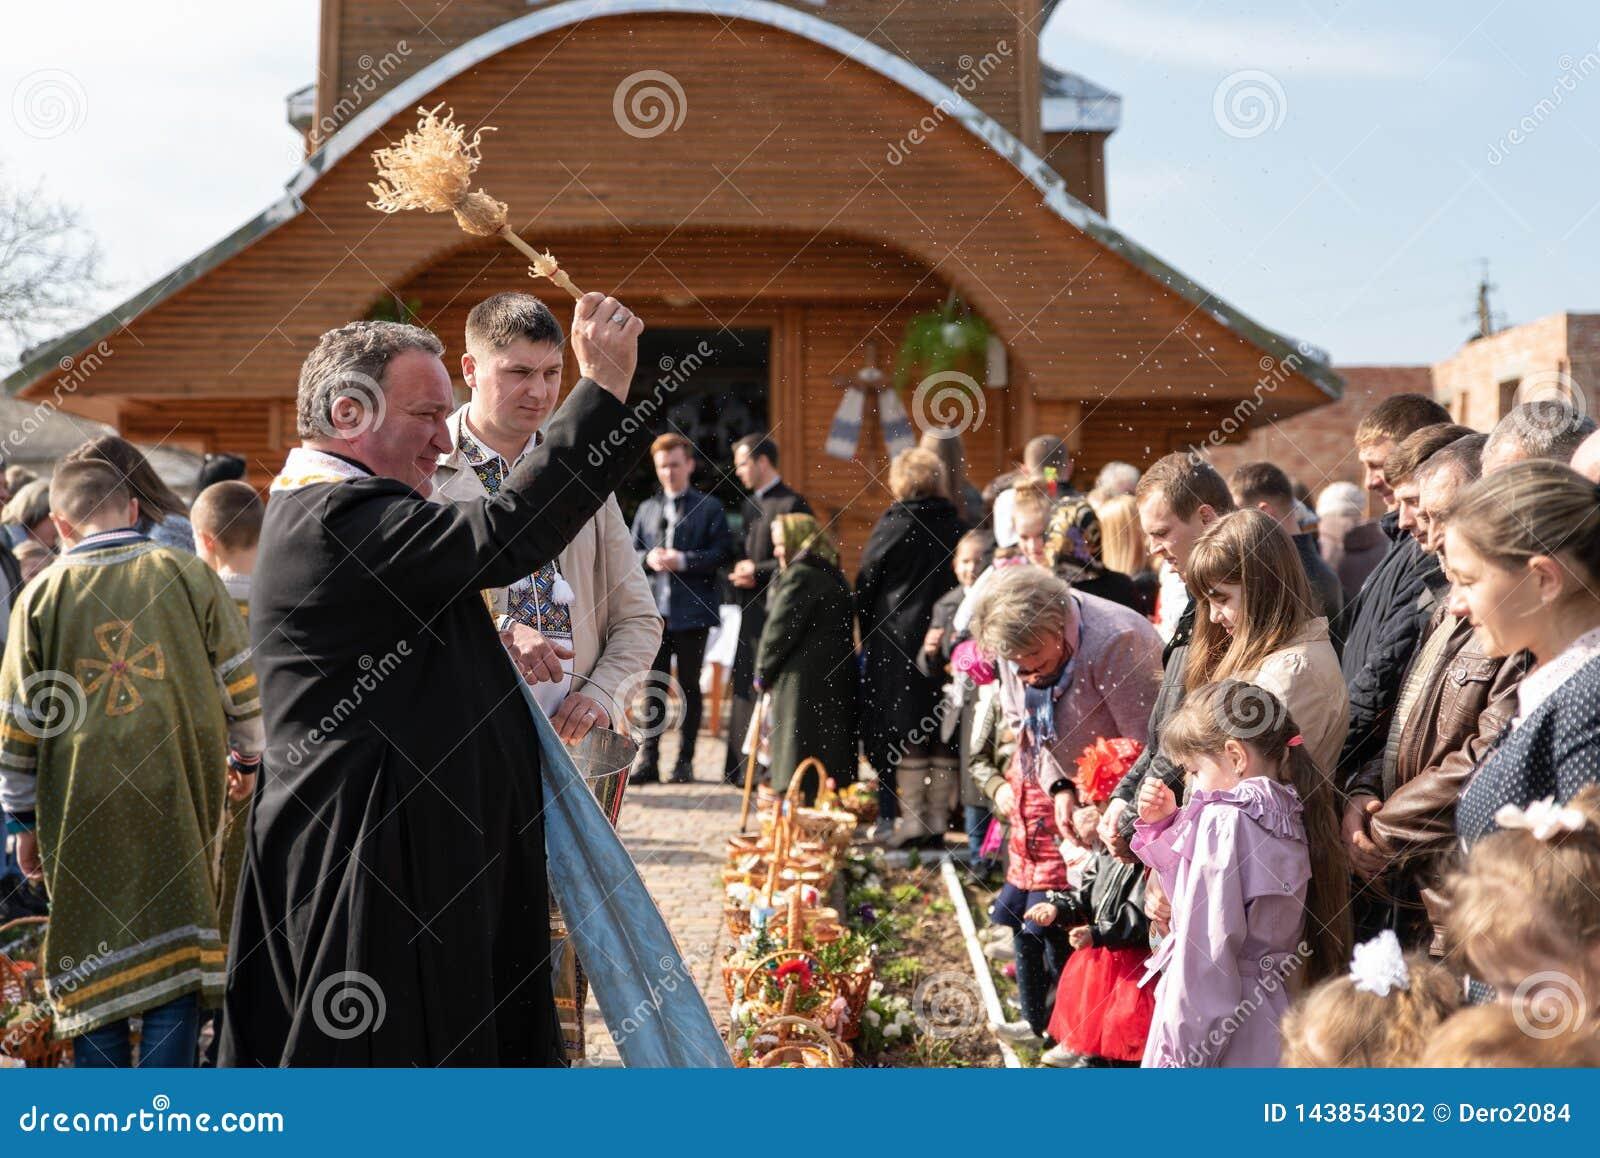 Voroblevychi village, Drohobych district, Ukraine - April 07, 2018: Priest consecrates Easter baskets with food